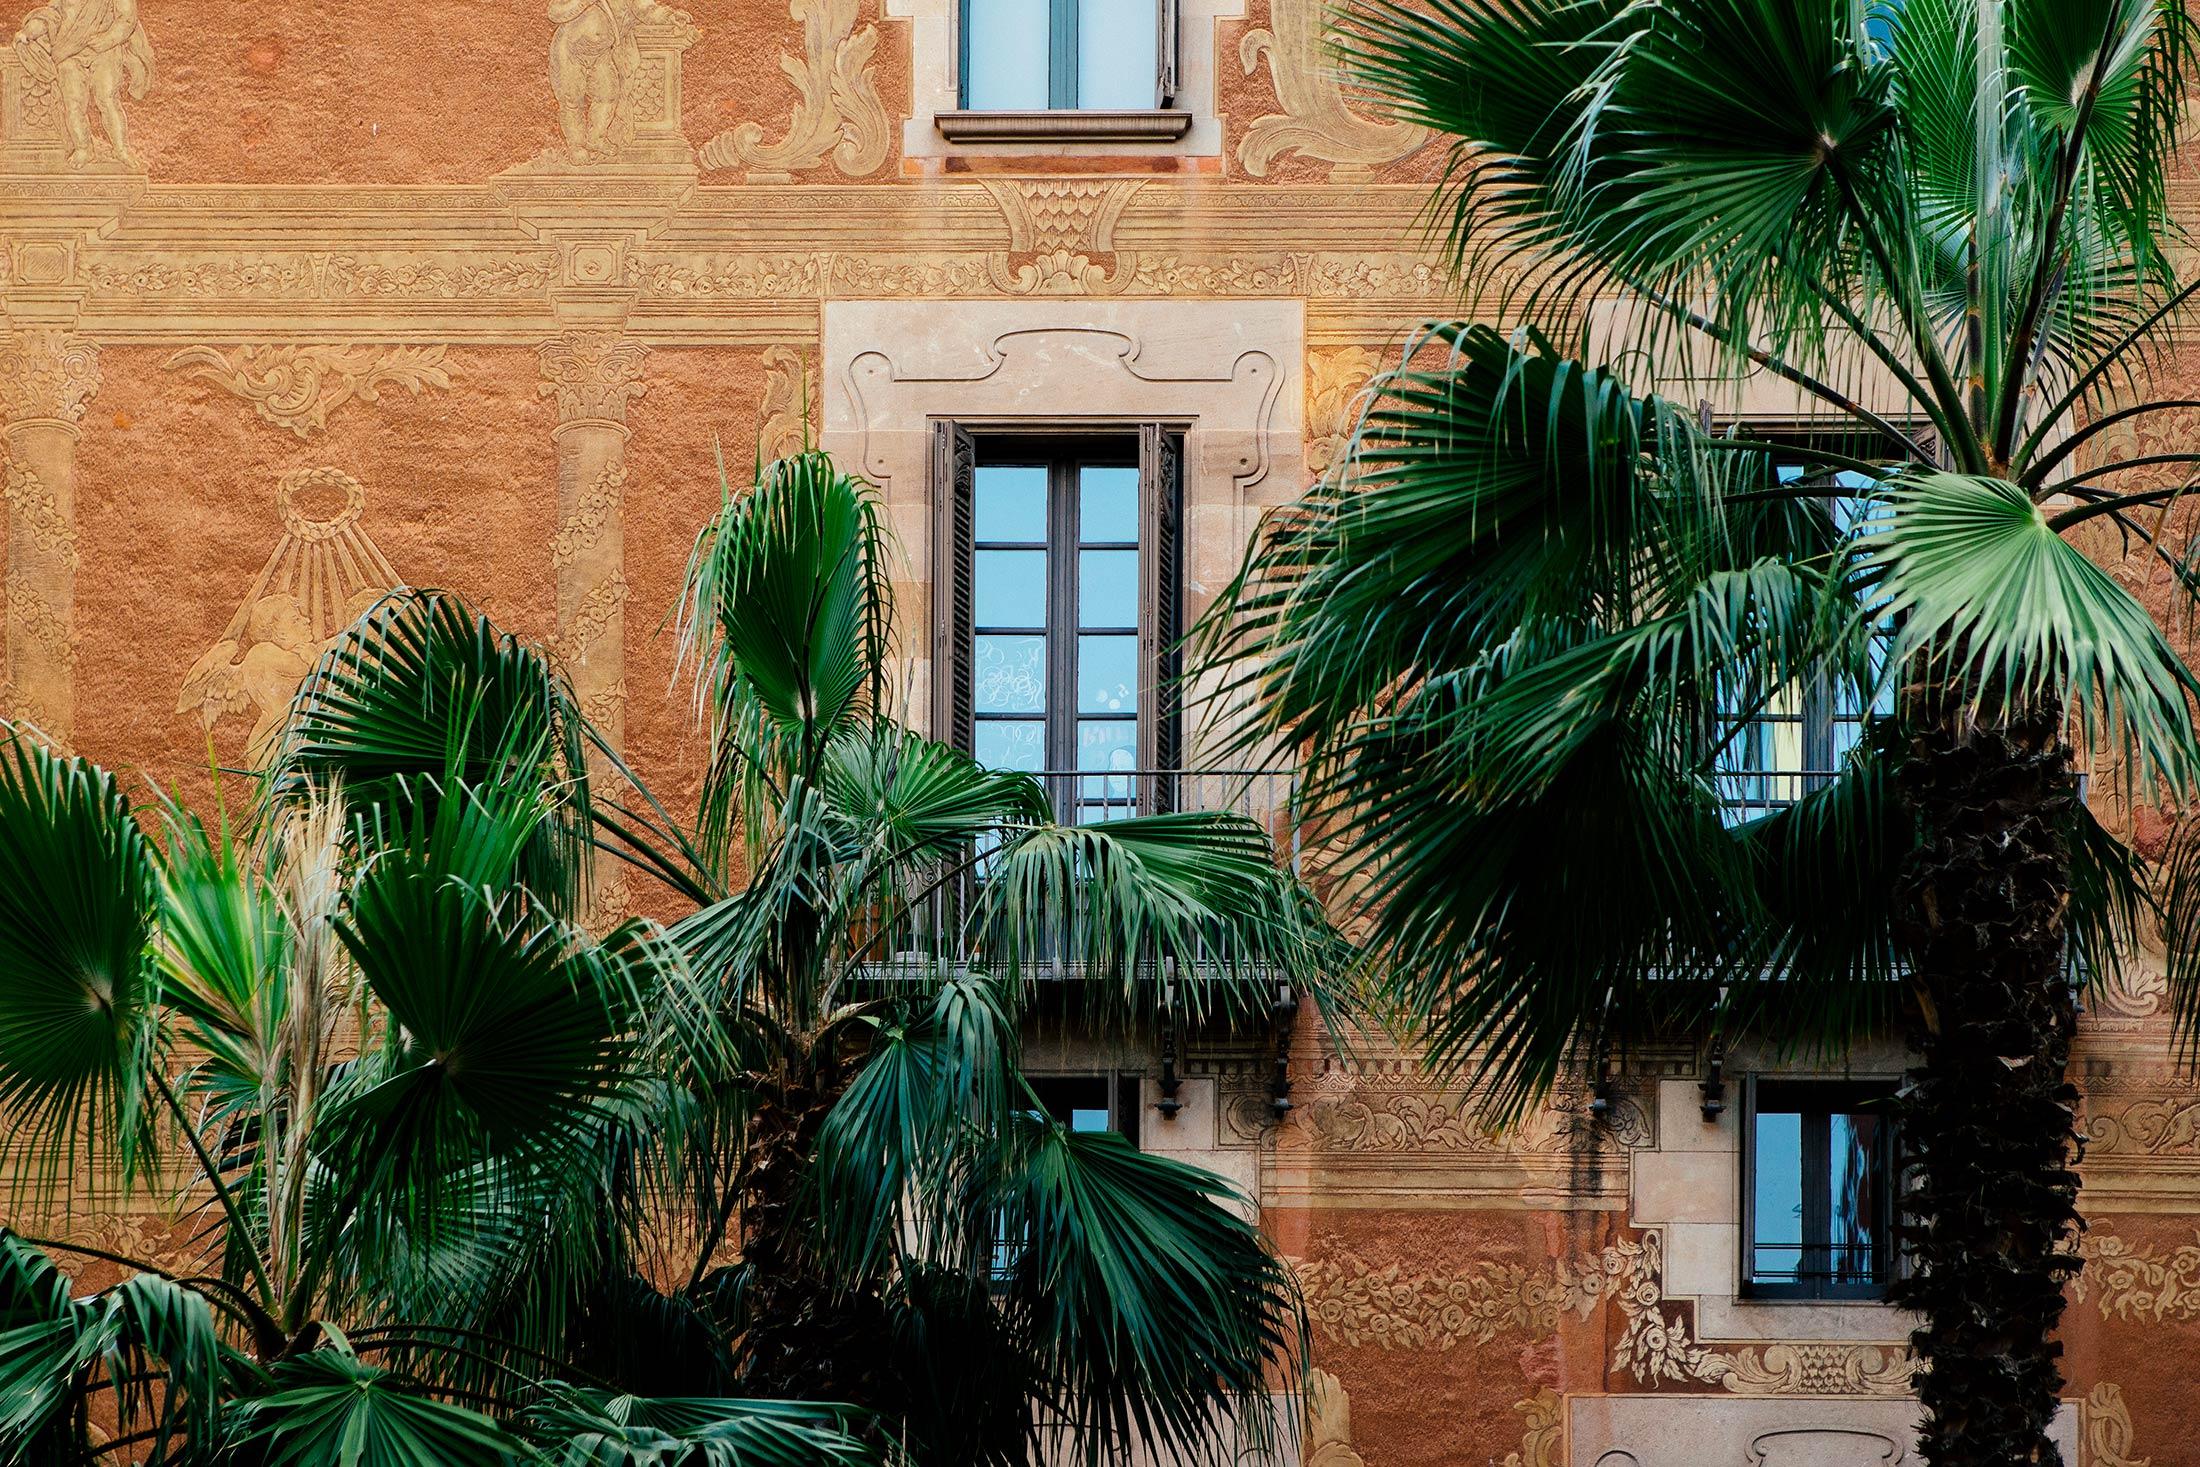 BCN_Barcelona_09-Mitja_Schneehage